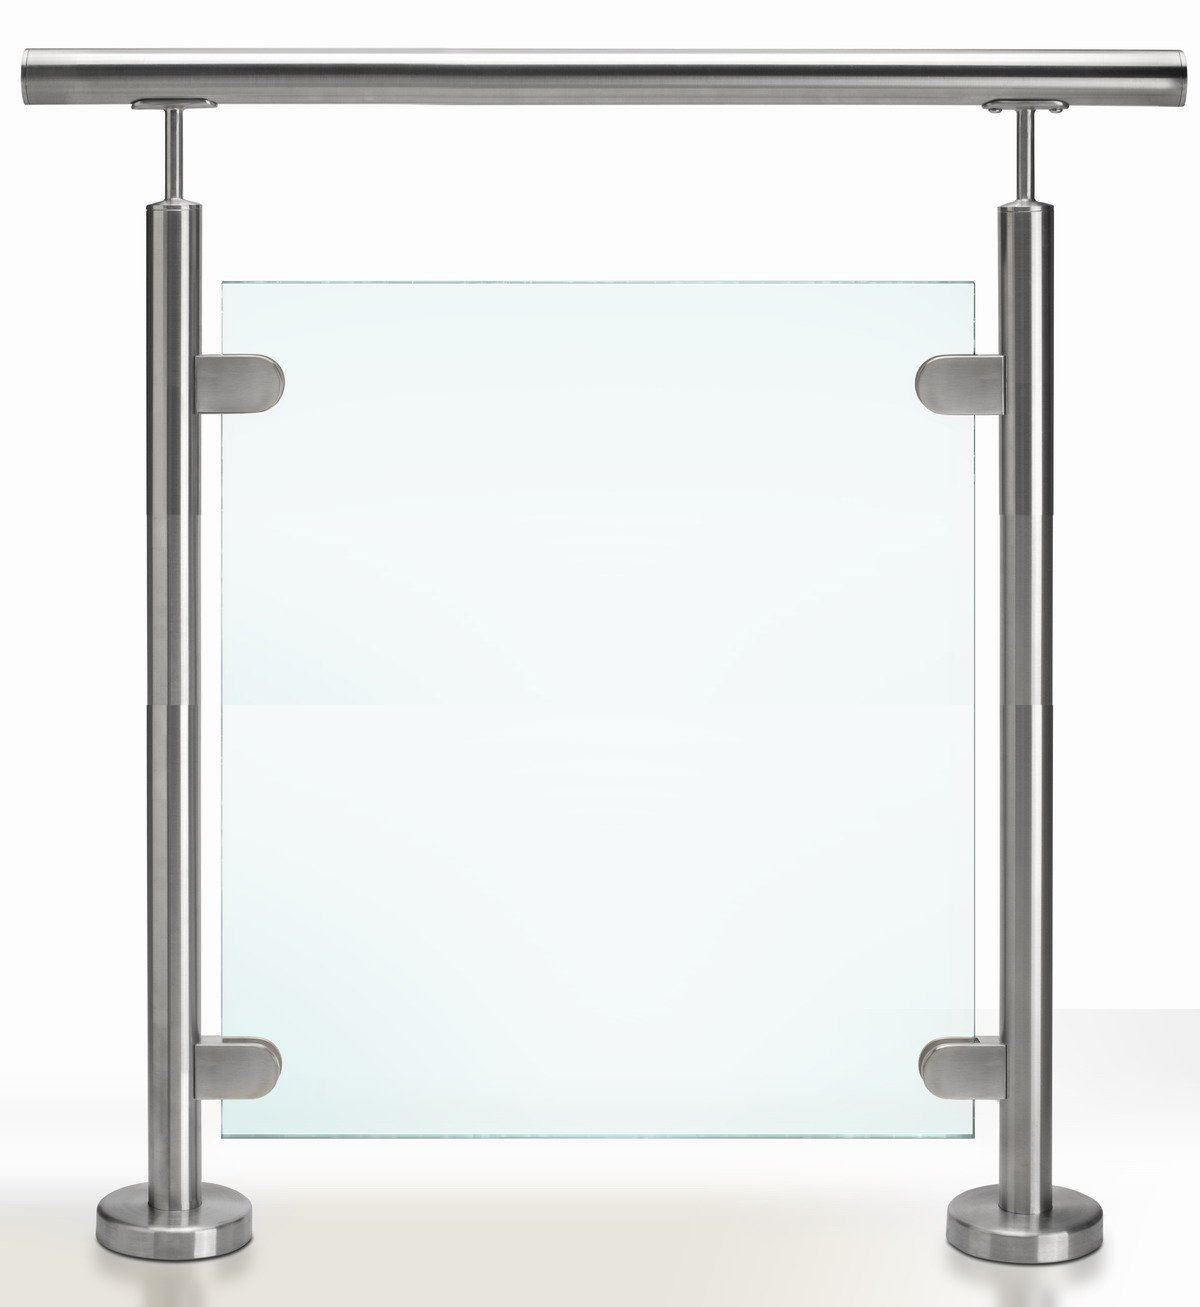 Balcony Temepred Glass Balustrade/Terrace Fence/Glass Railing